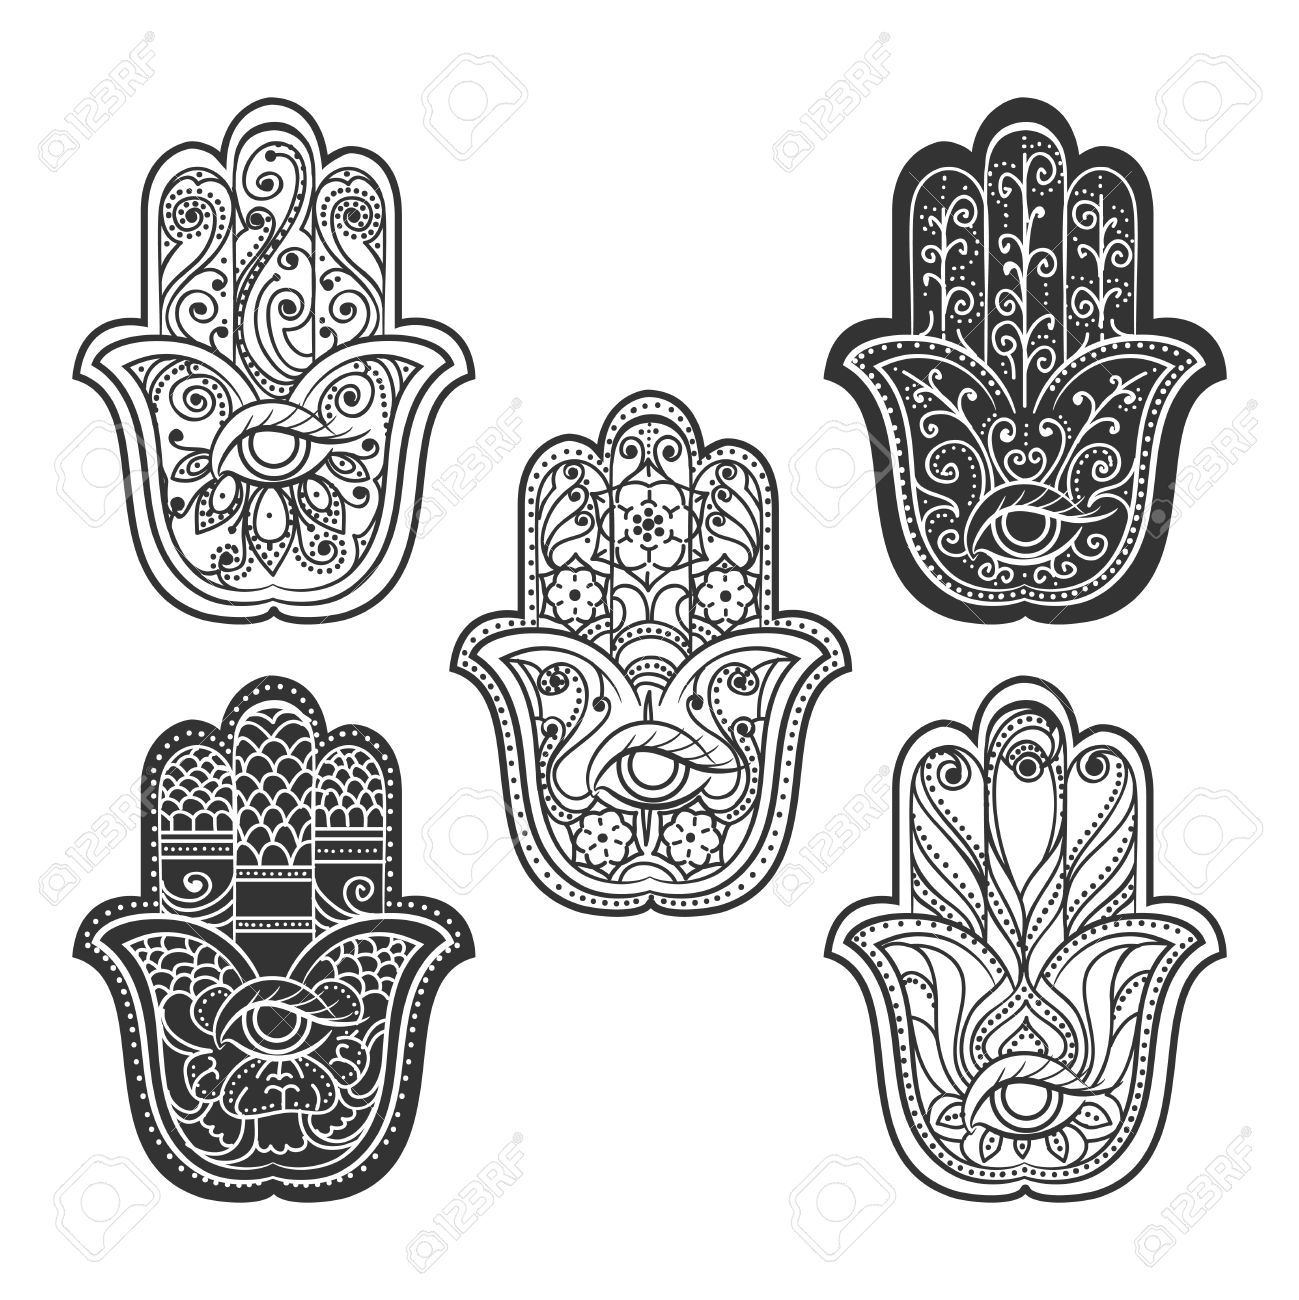 indian hamsa hand mit auge spiritual ethnischen ornament vektor illustration tattoo mandala. Black Bedroom Furniture Sets. Home Design Ideas